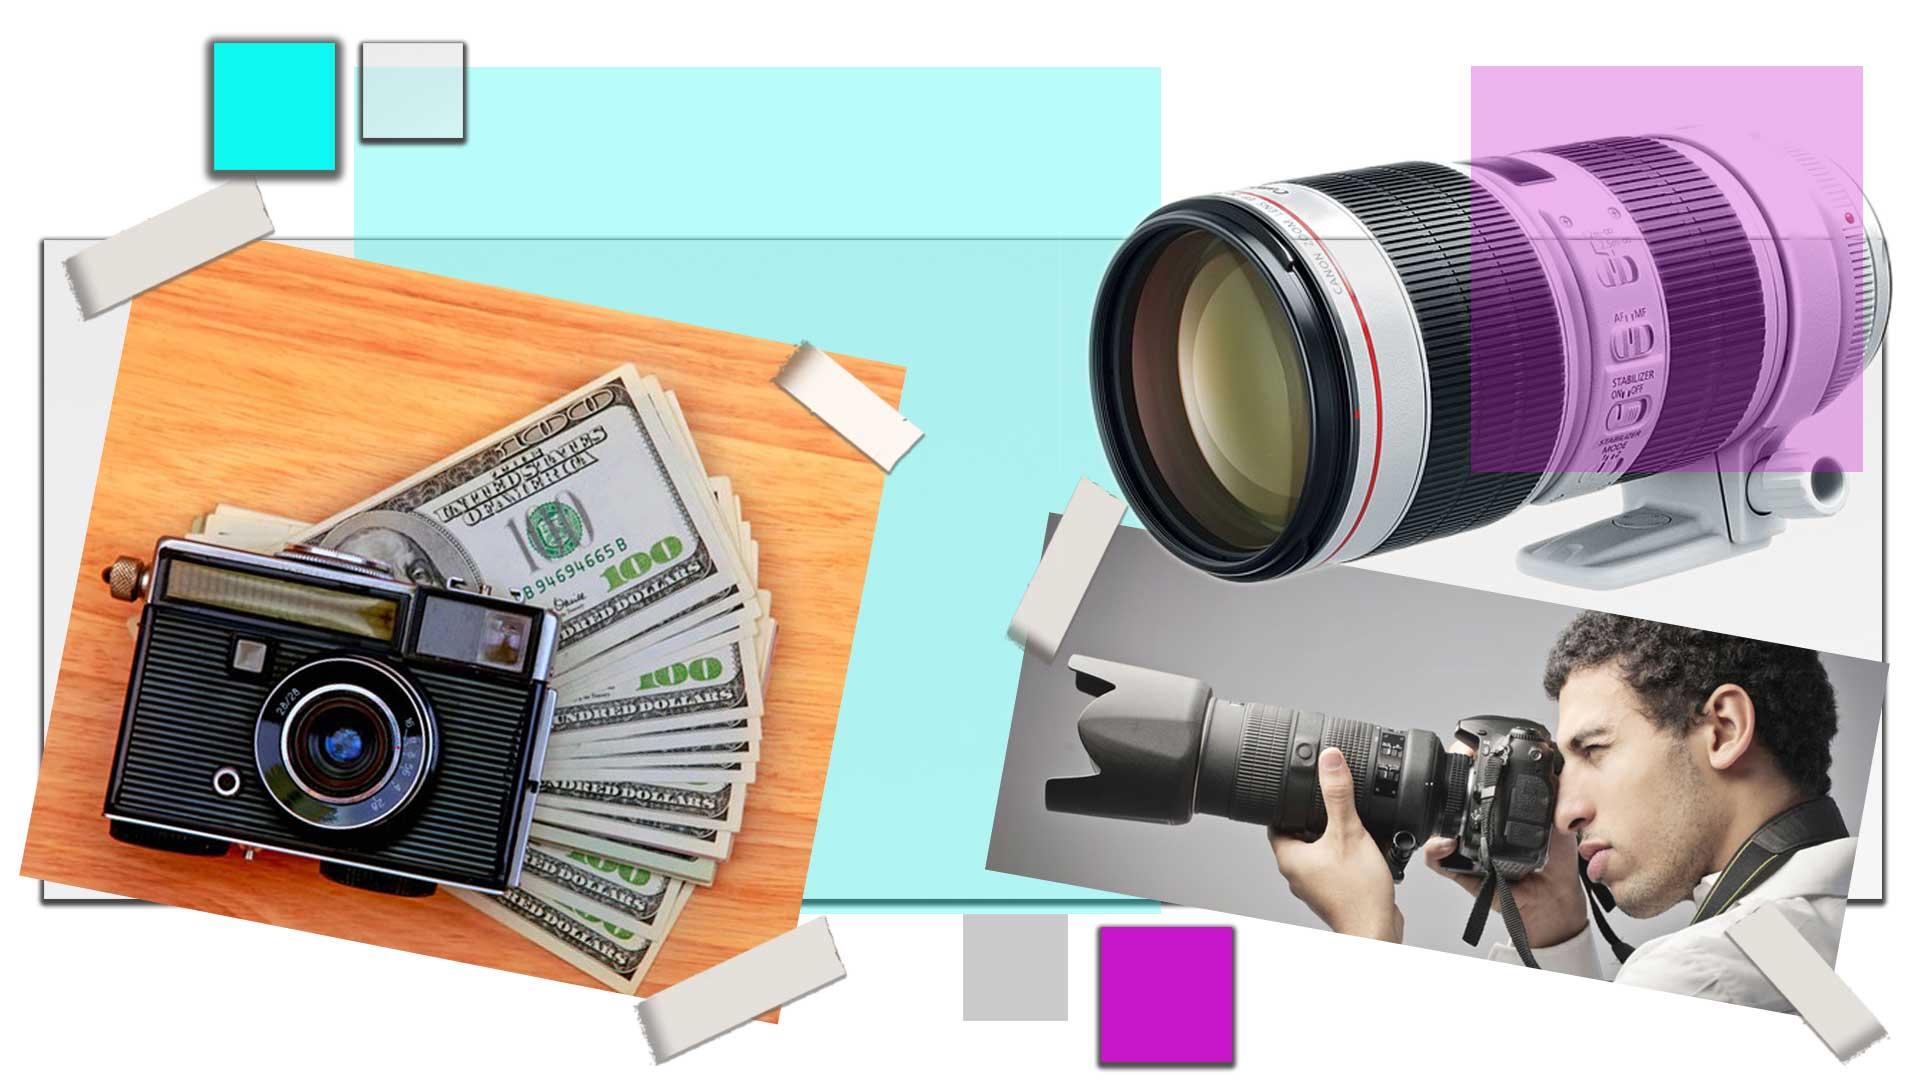 professiona1 photographe 17a - چگونه میتوان حرفه عکاسی را برای همیشه داشت ؟